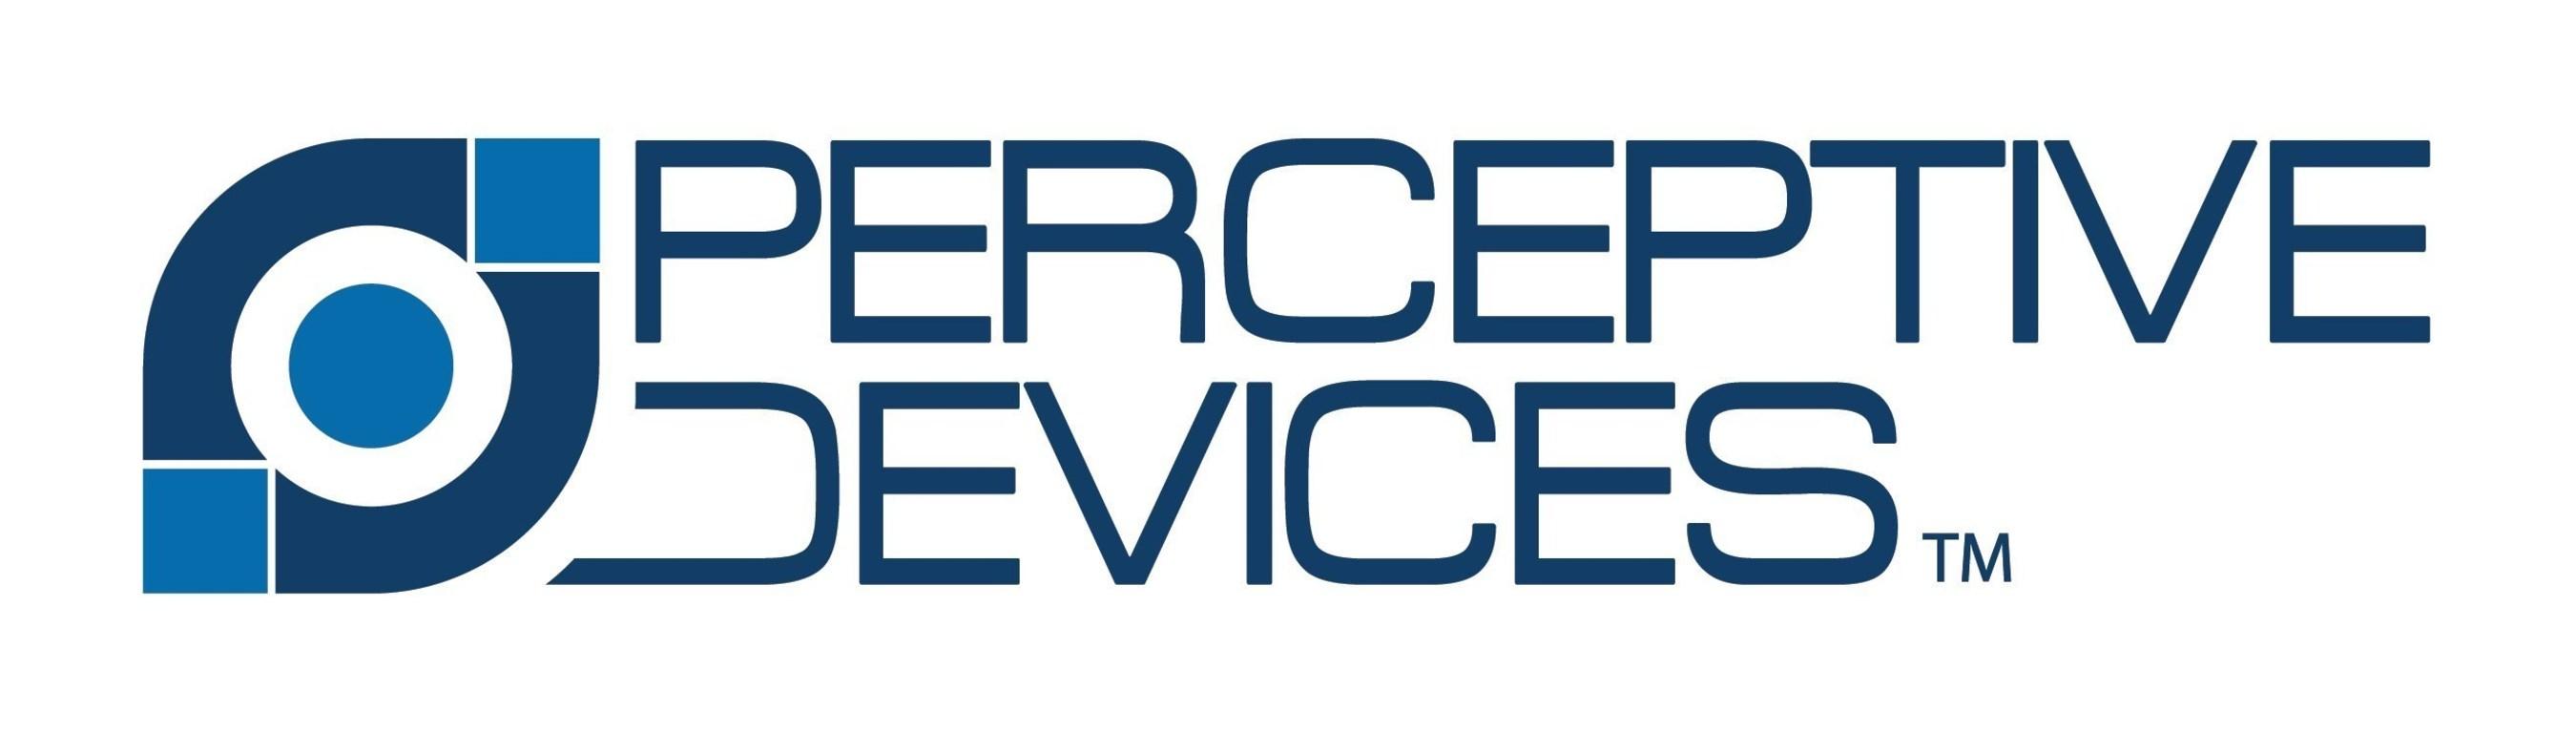 Perceptive Devices Logo